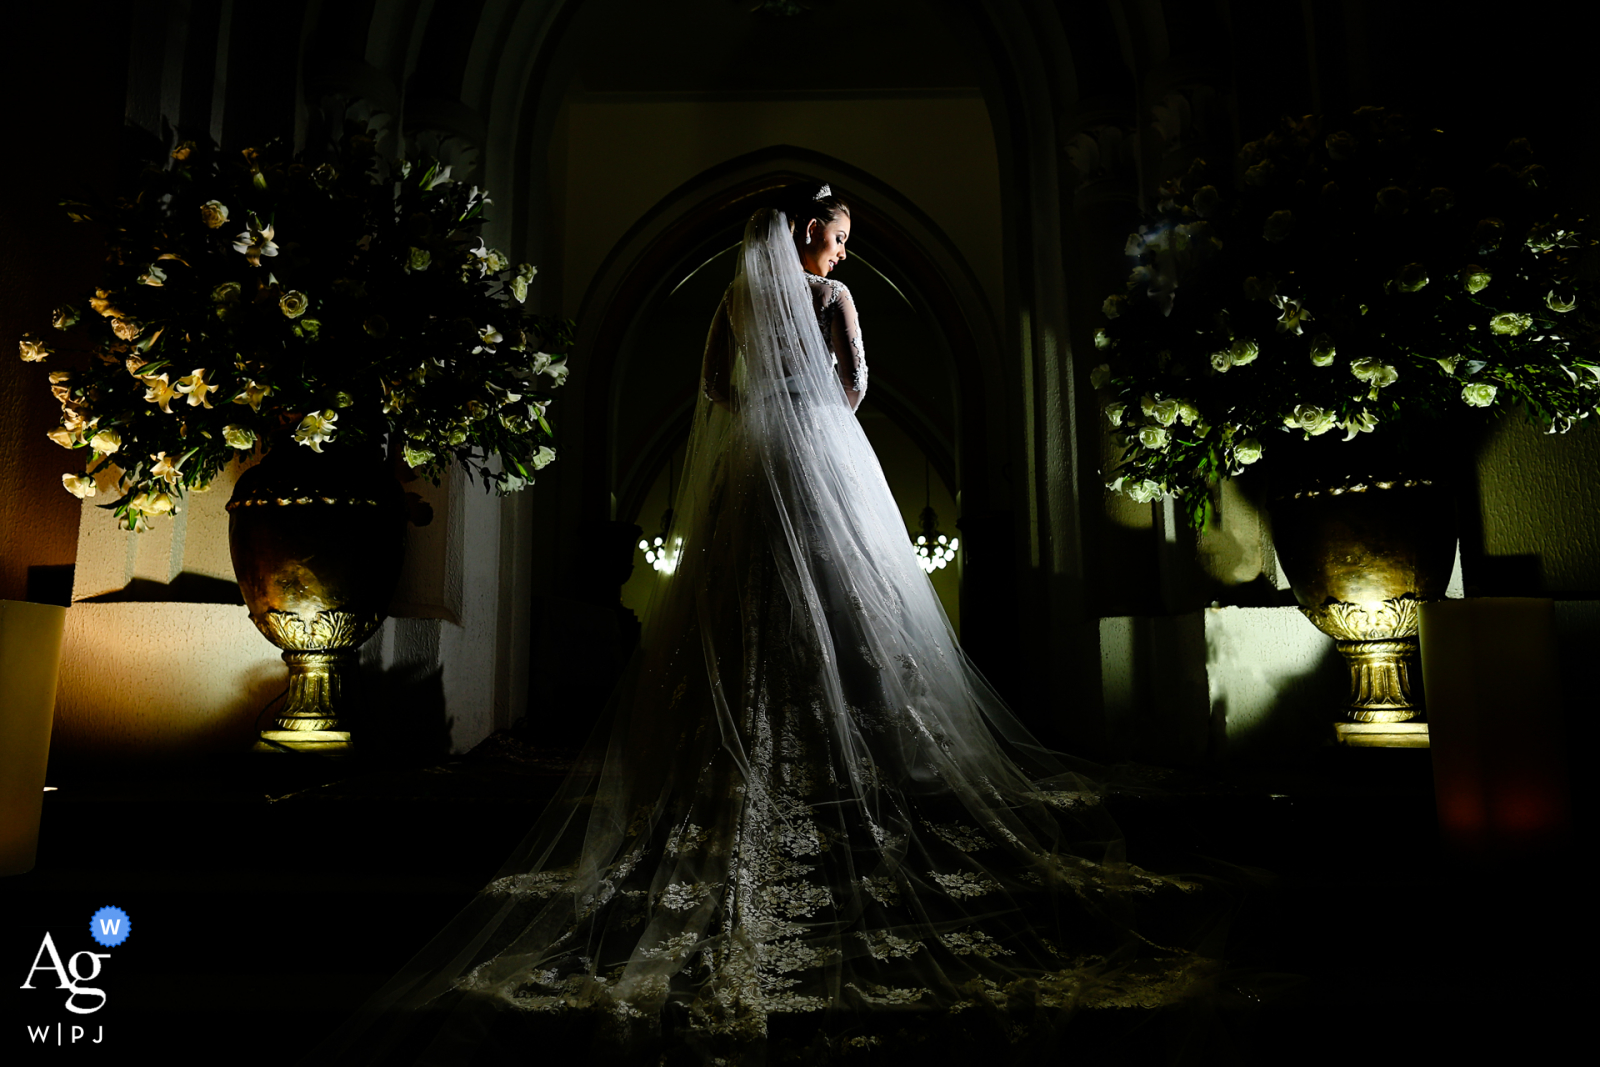 Ipameri creative wedding portrait of the bride